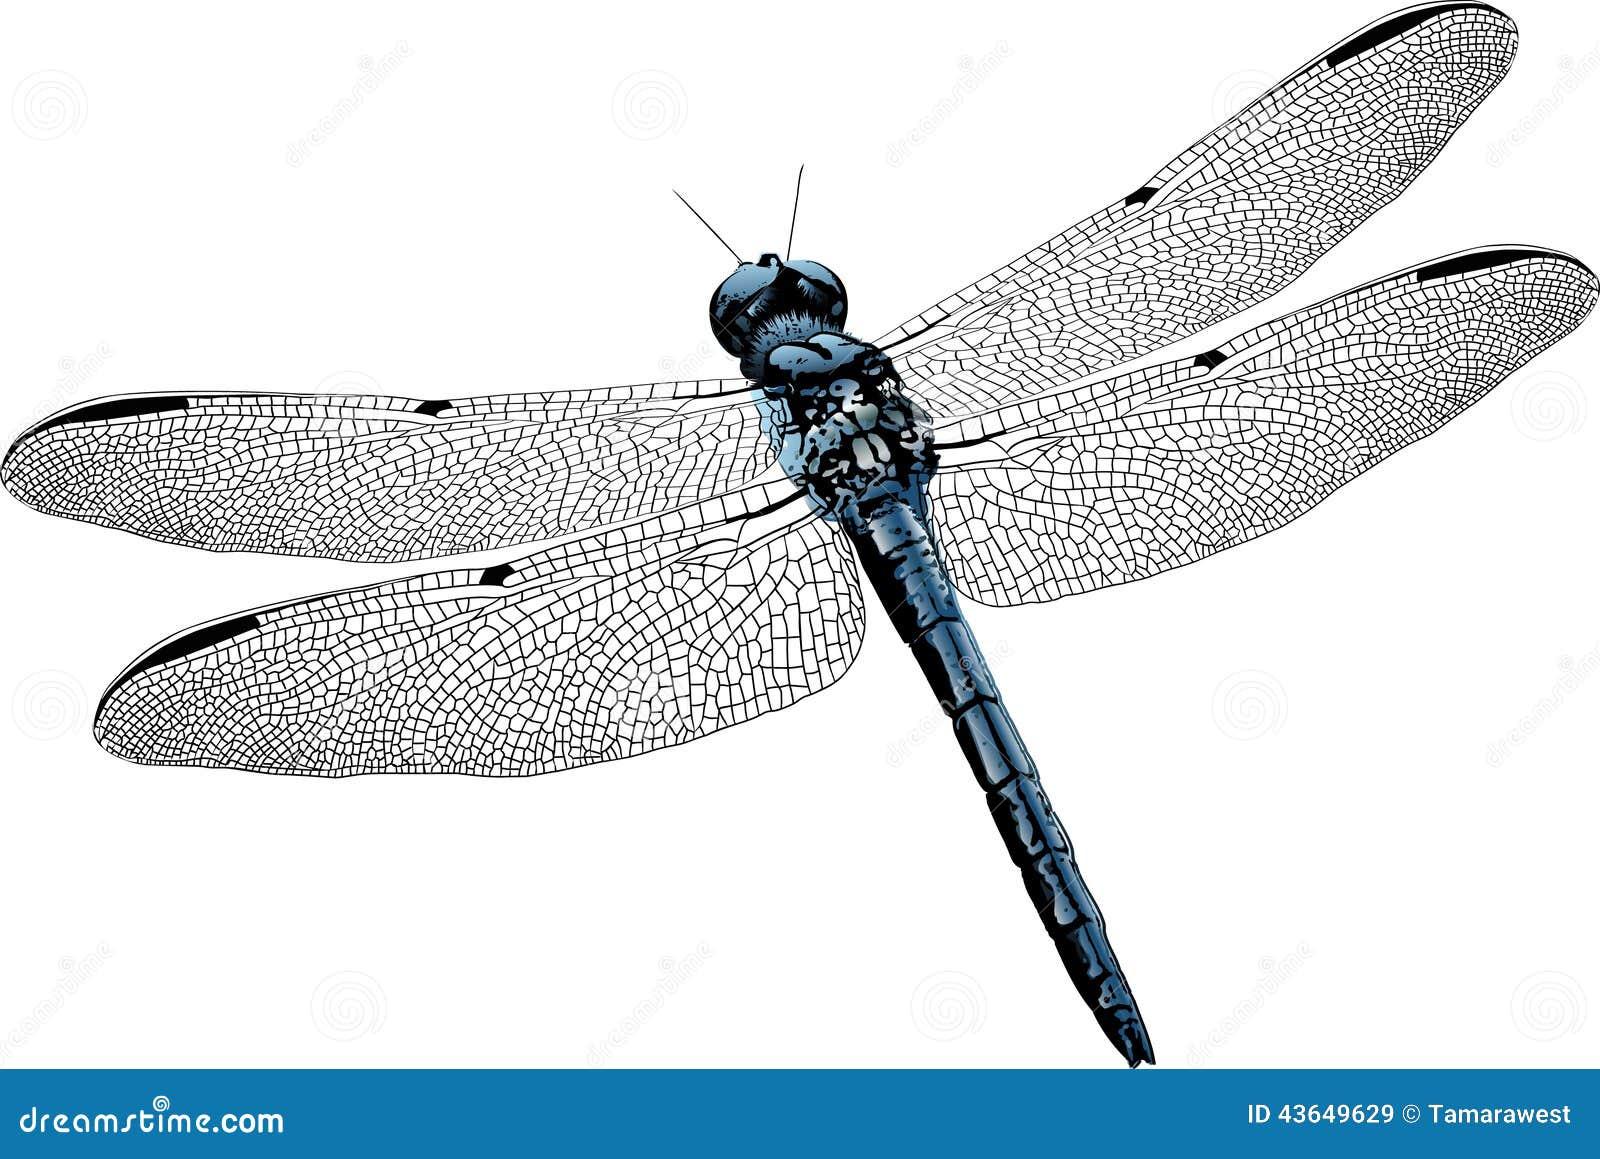 Dragonfly anatomy diagram 4598714 - follow4more.info